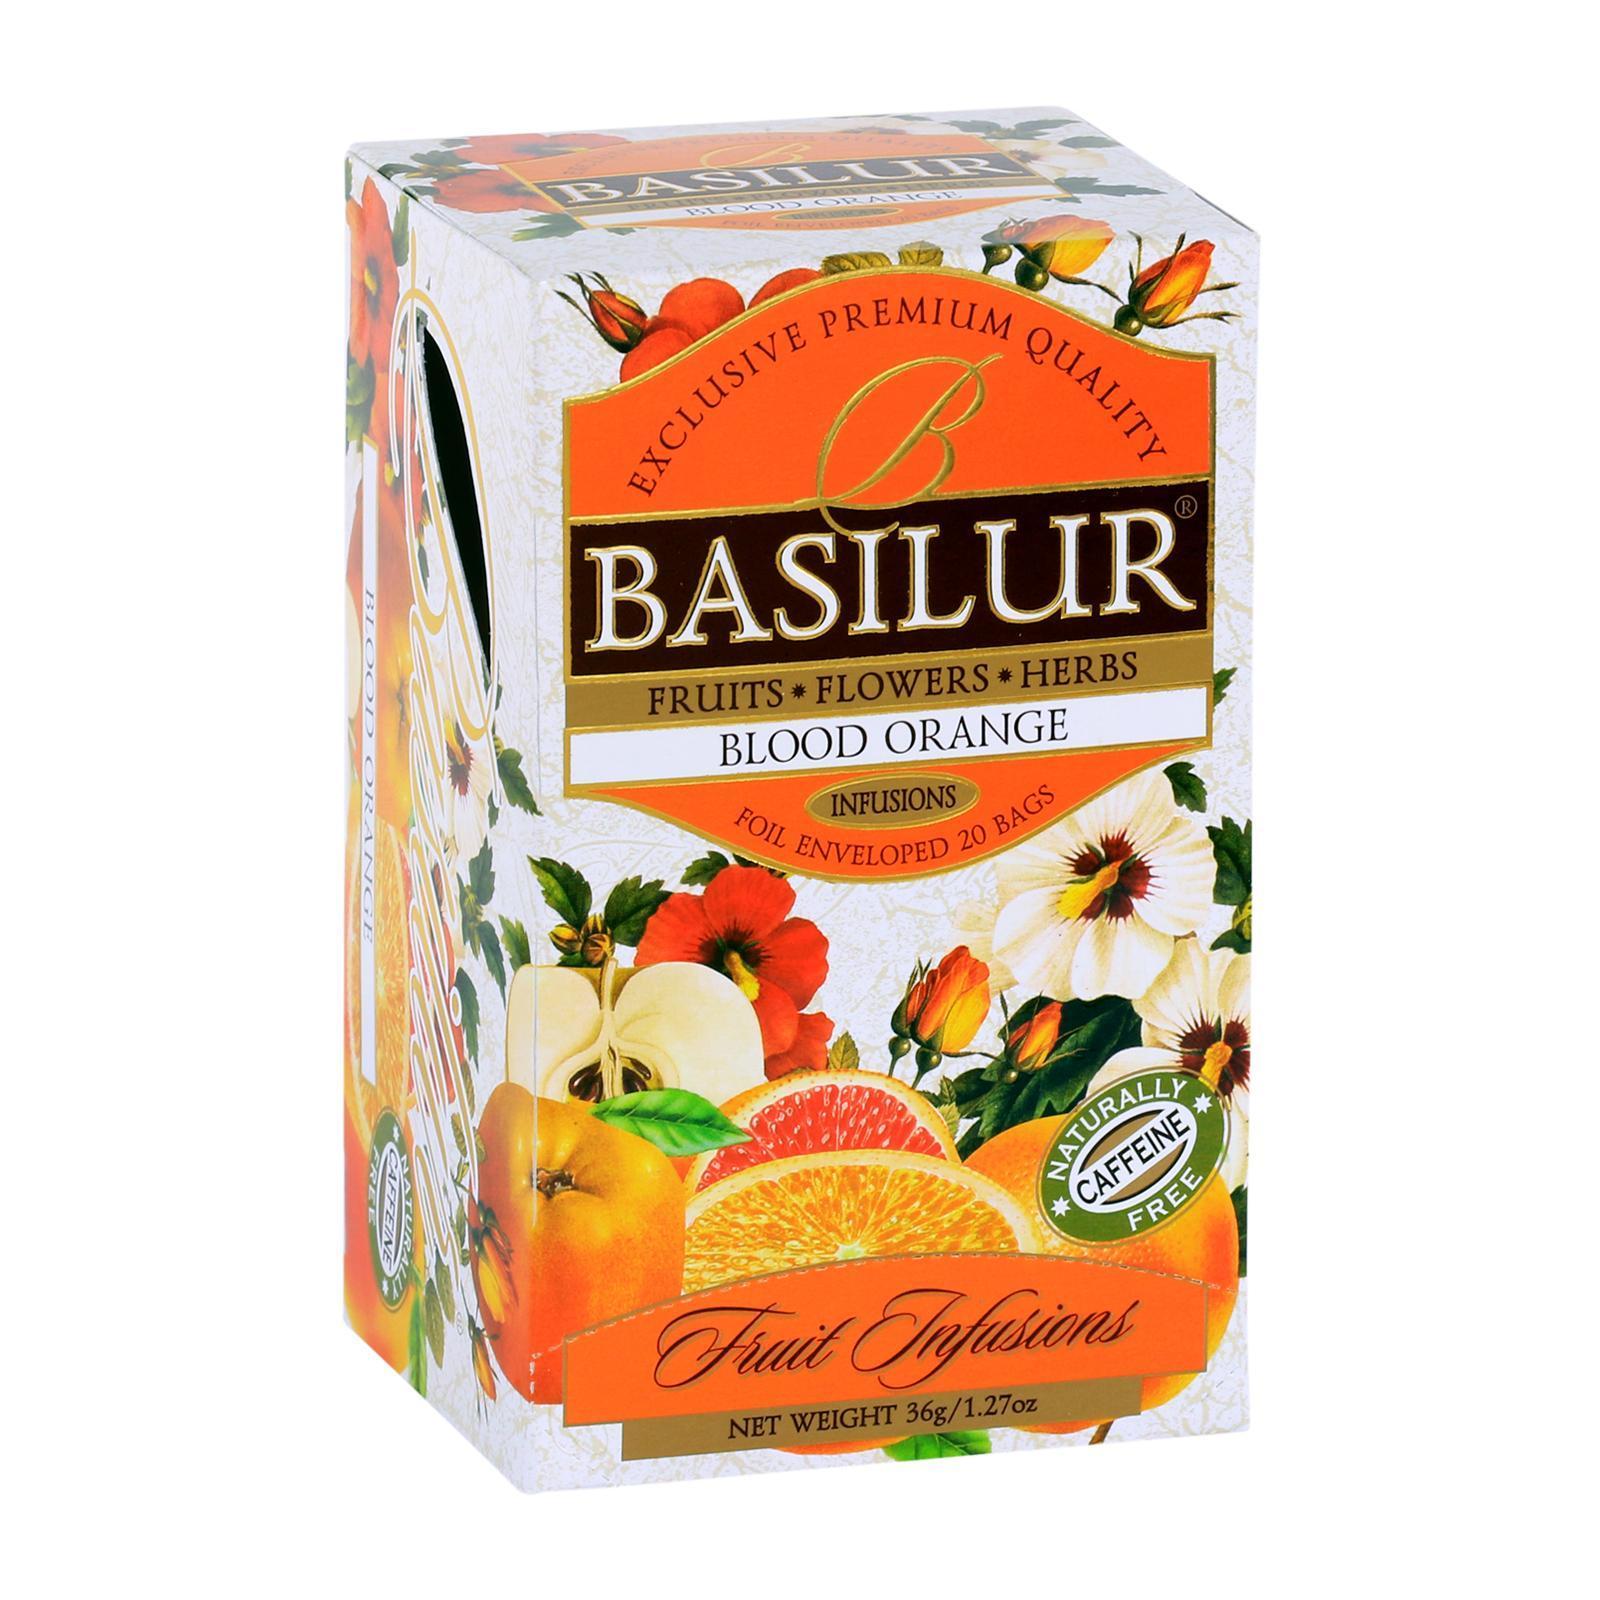 Basilur Caffeine-Free Blood Orange Fruit Infusions Herbal Tea